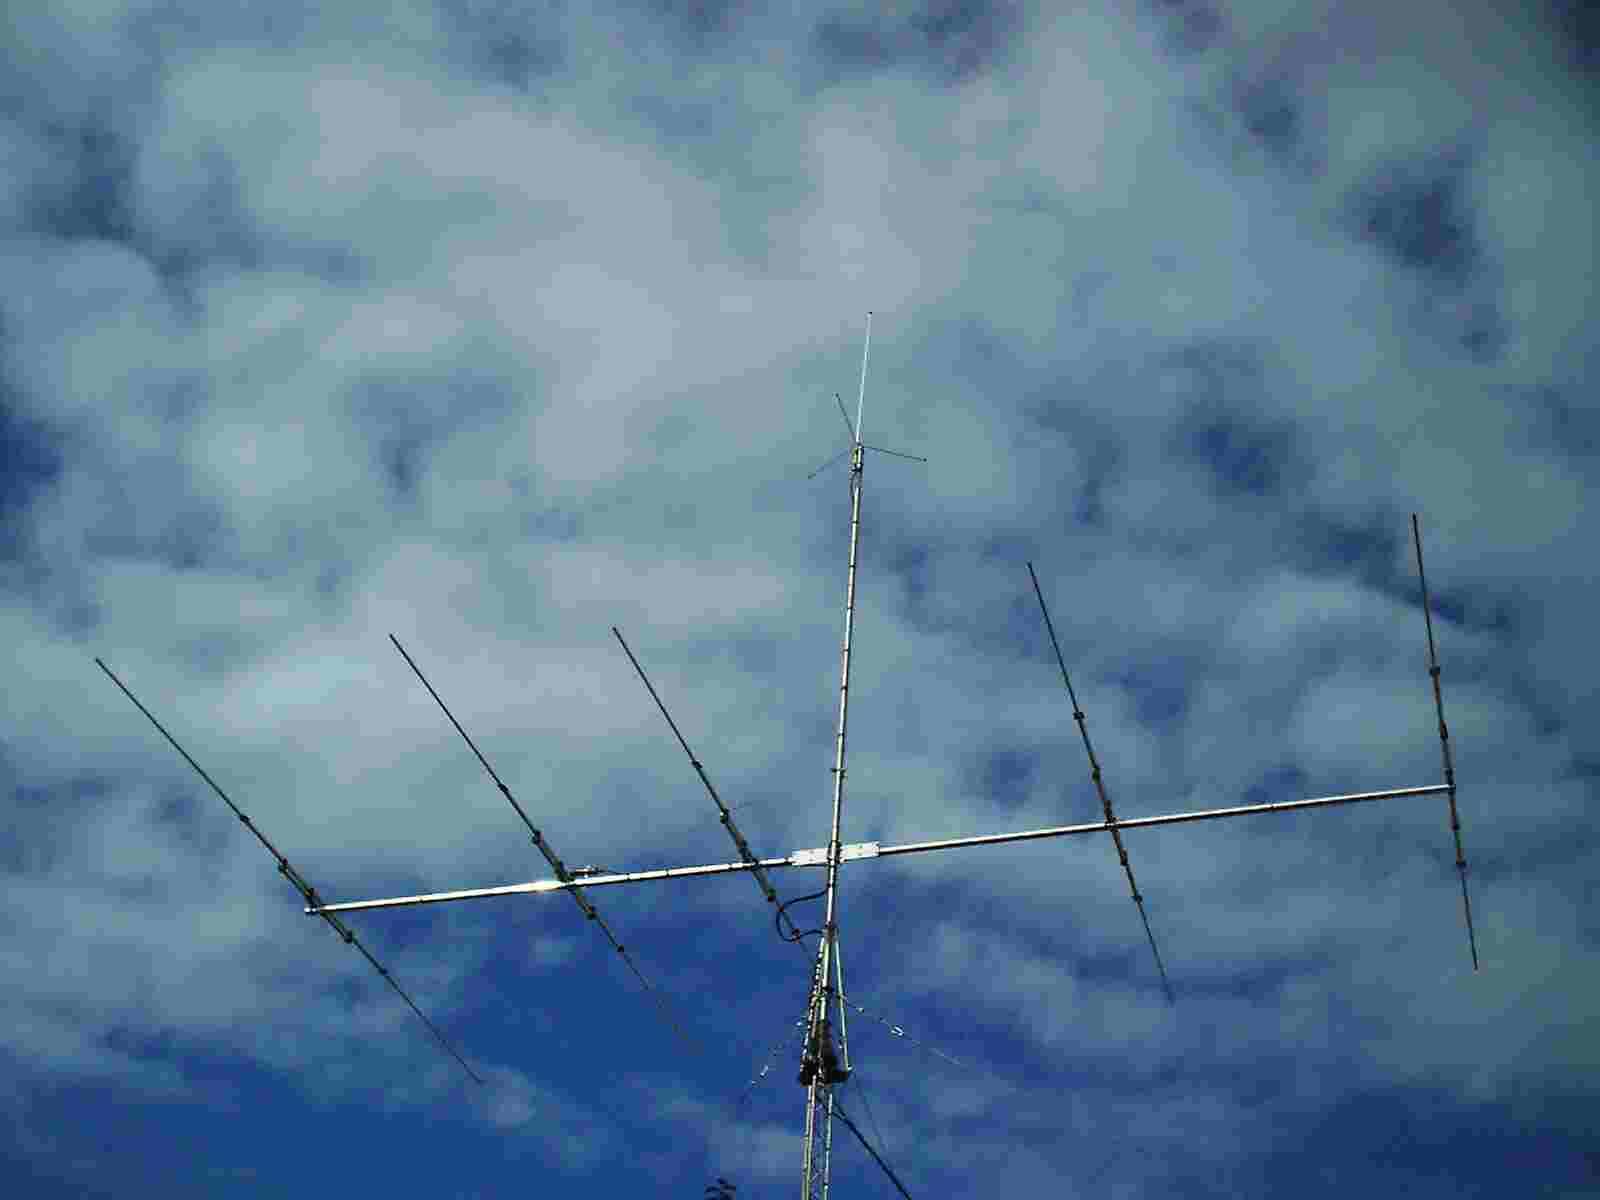 antenna ik3ldl